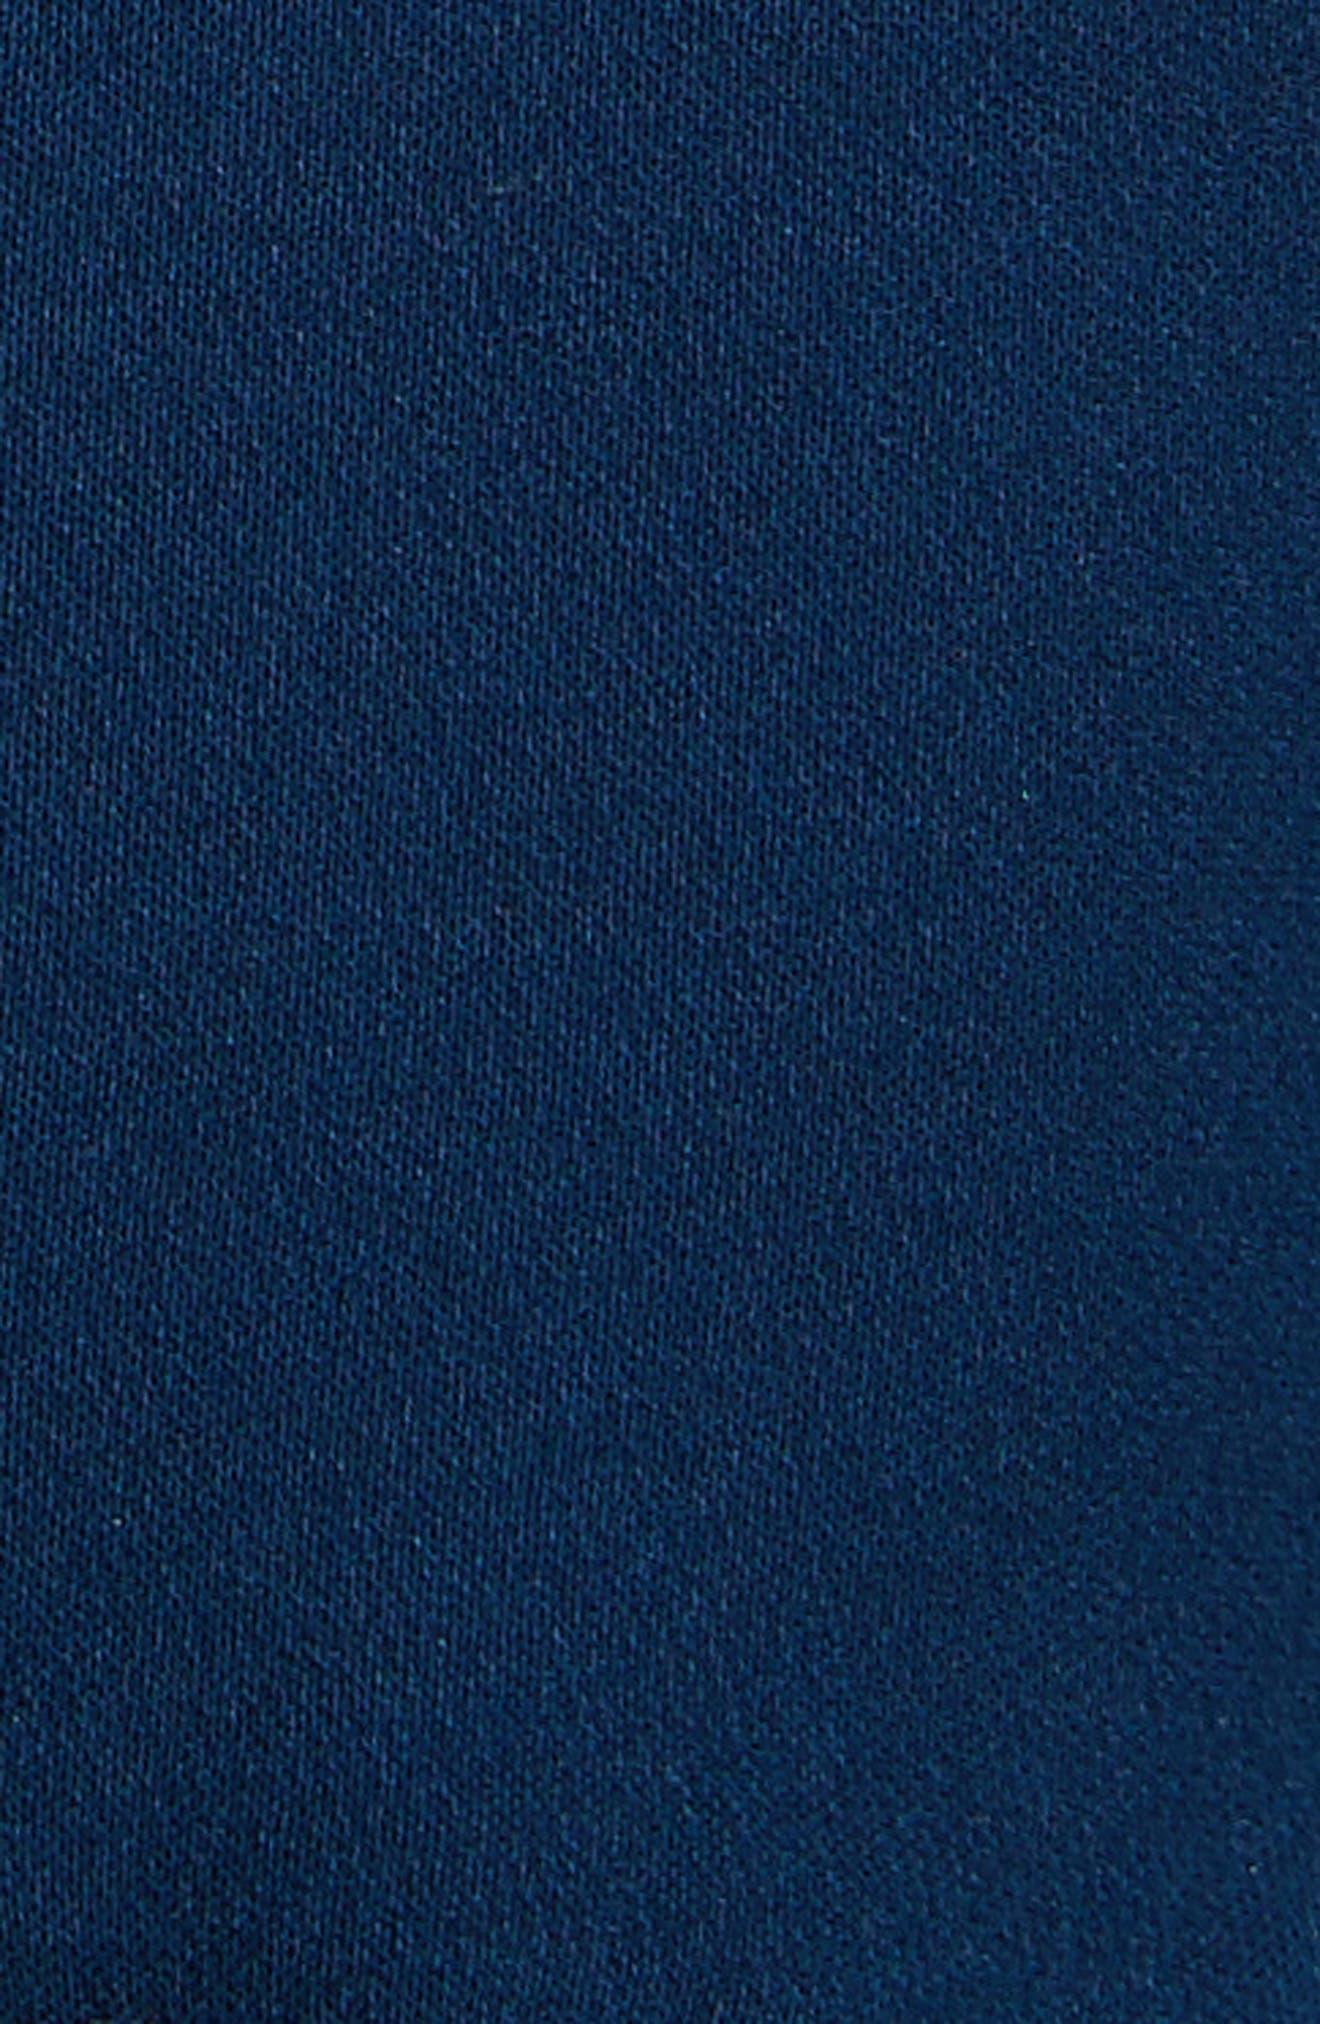 Taghrid Ruffle Silk Dress,                             Alternate thumbnail 5, color,                             495